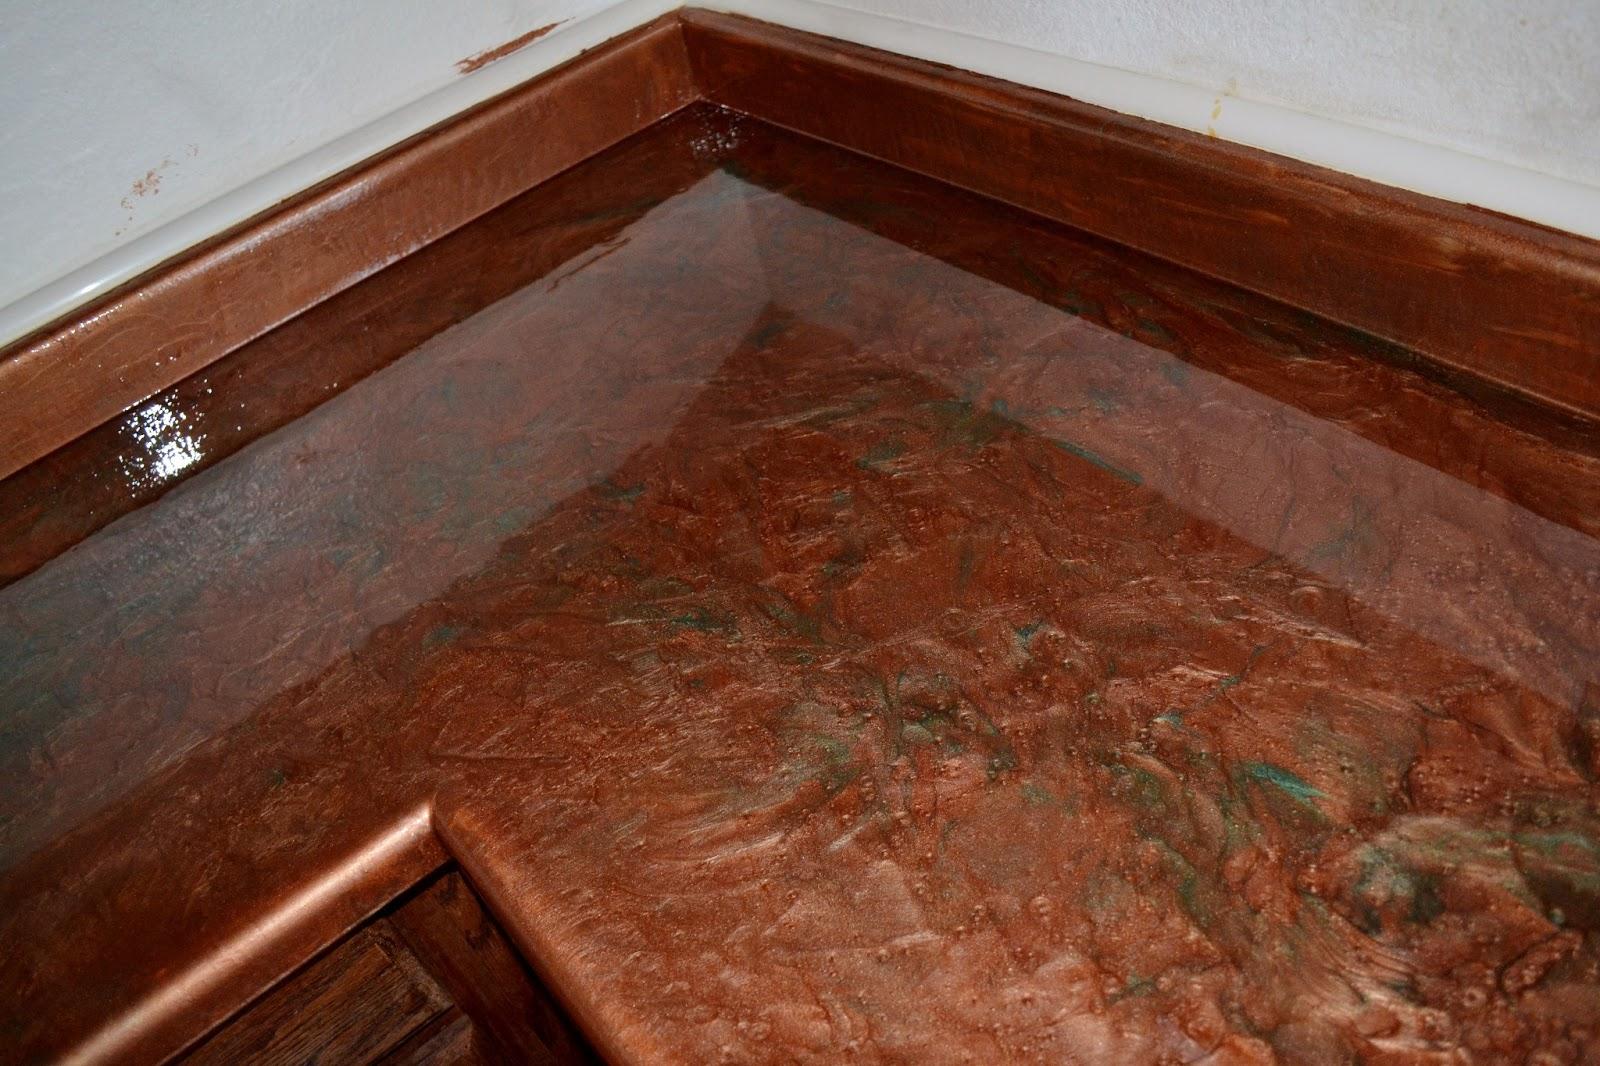 Covering Countertops To Look Like Granite : Concrete countertops over laminate